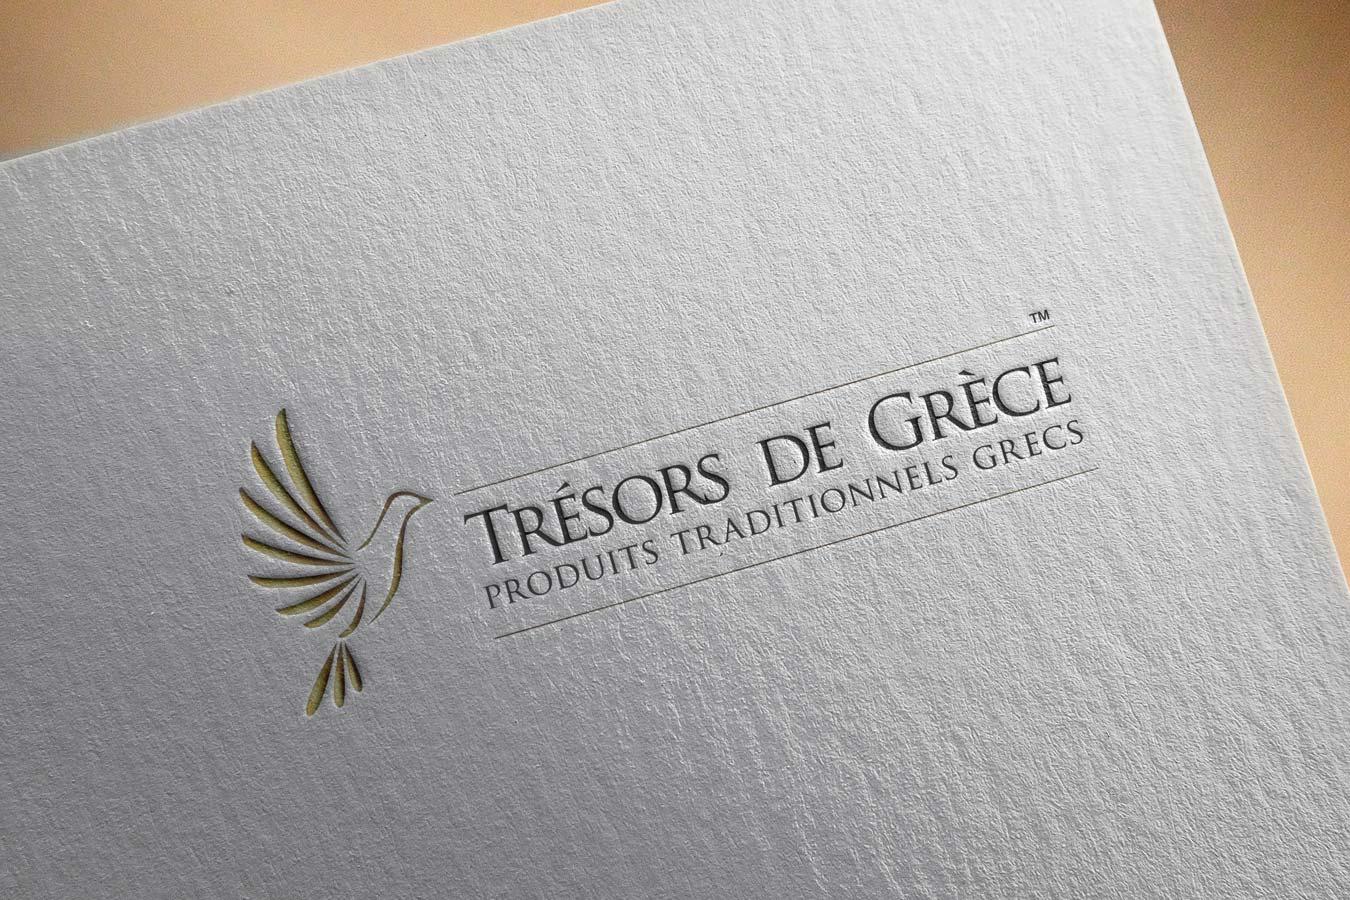 Tresors del Grece logo